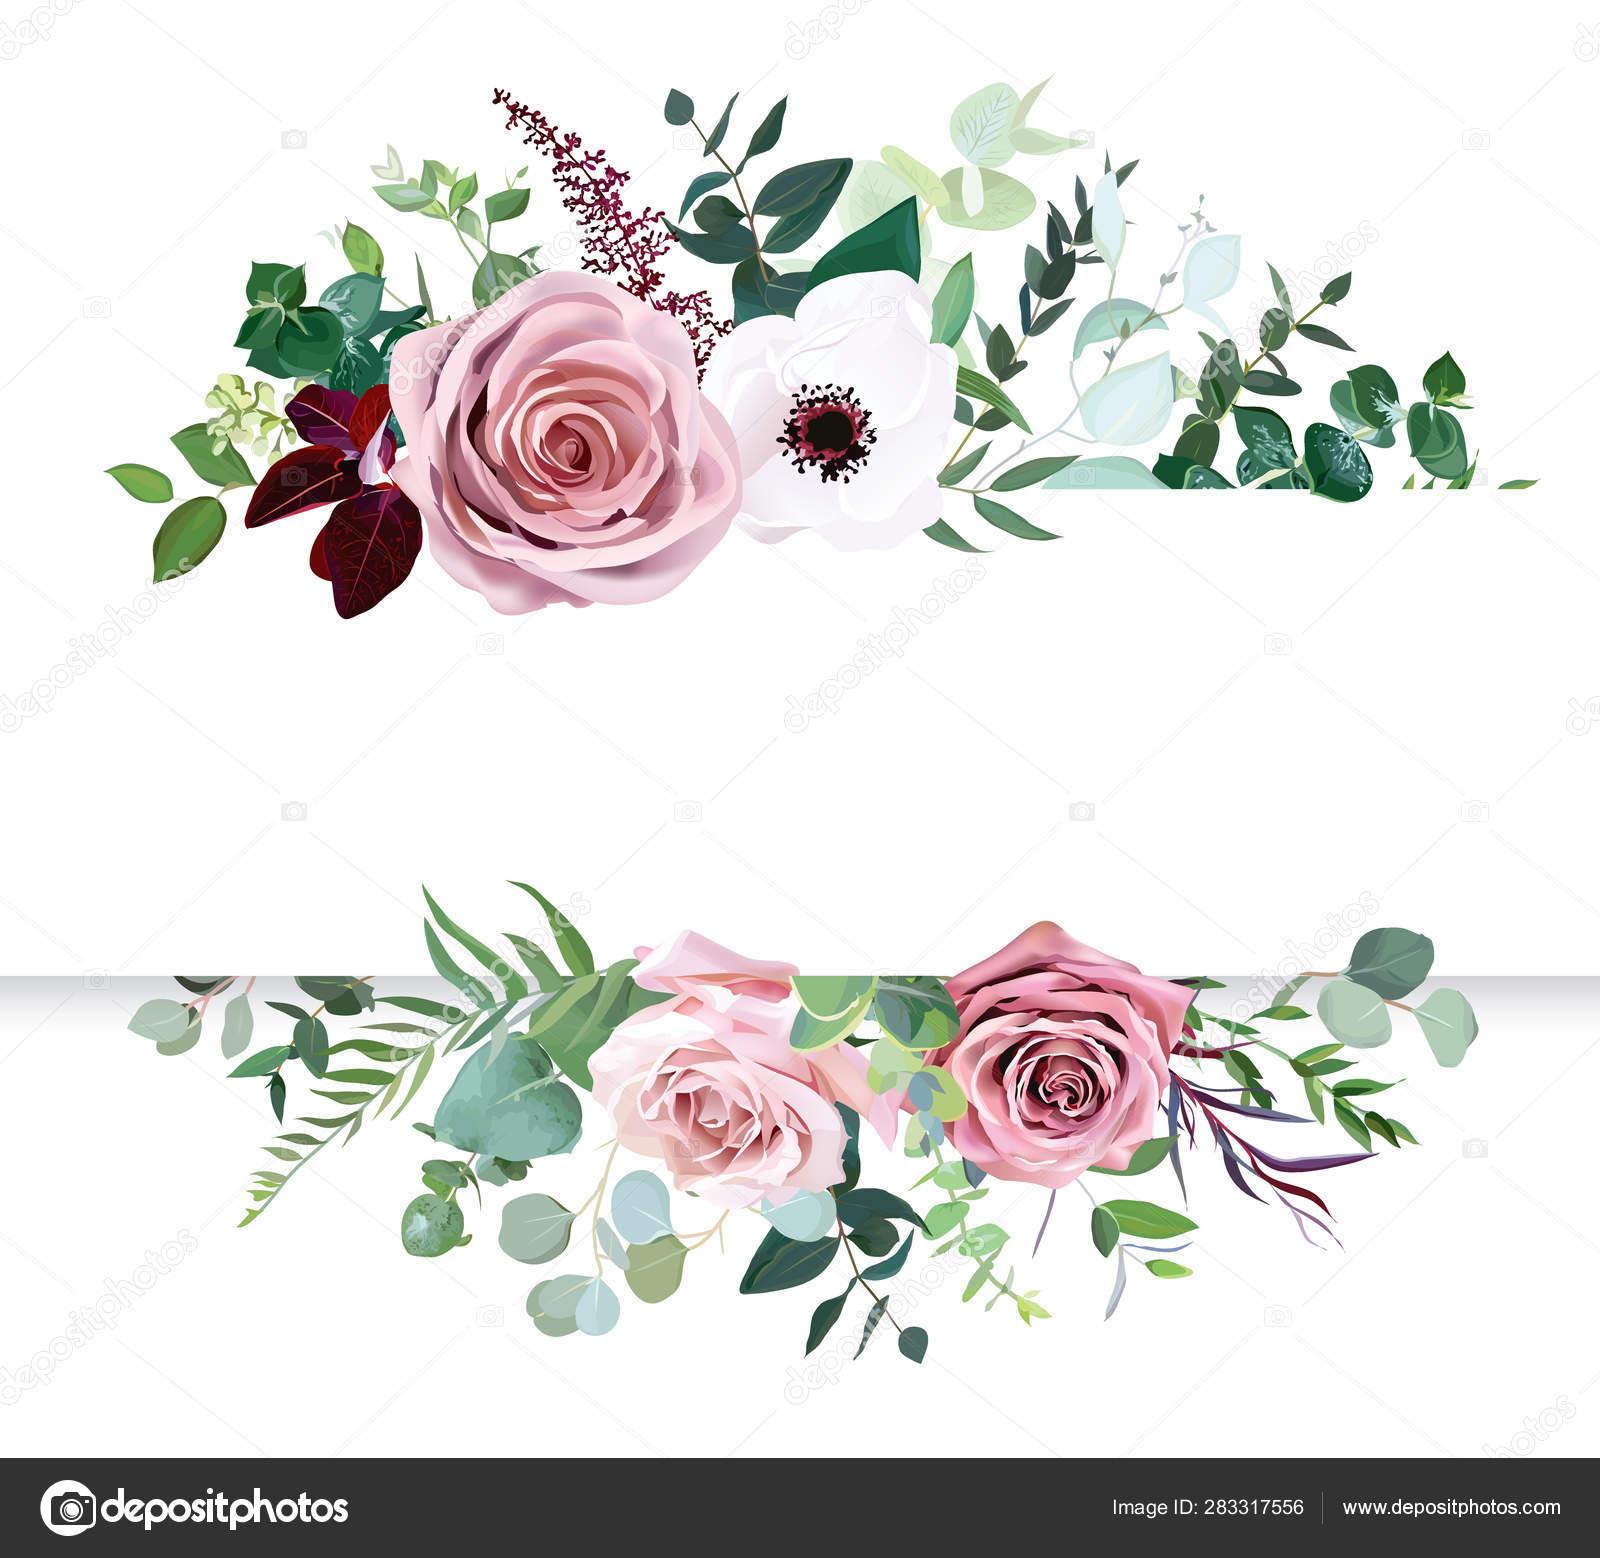 Dusty Pink Rose Pale Flowers White Anemone Horizontal Botanical